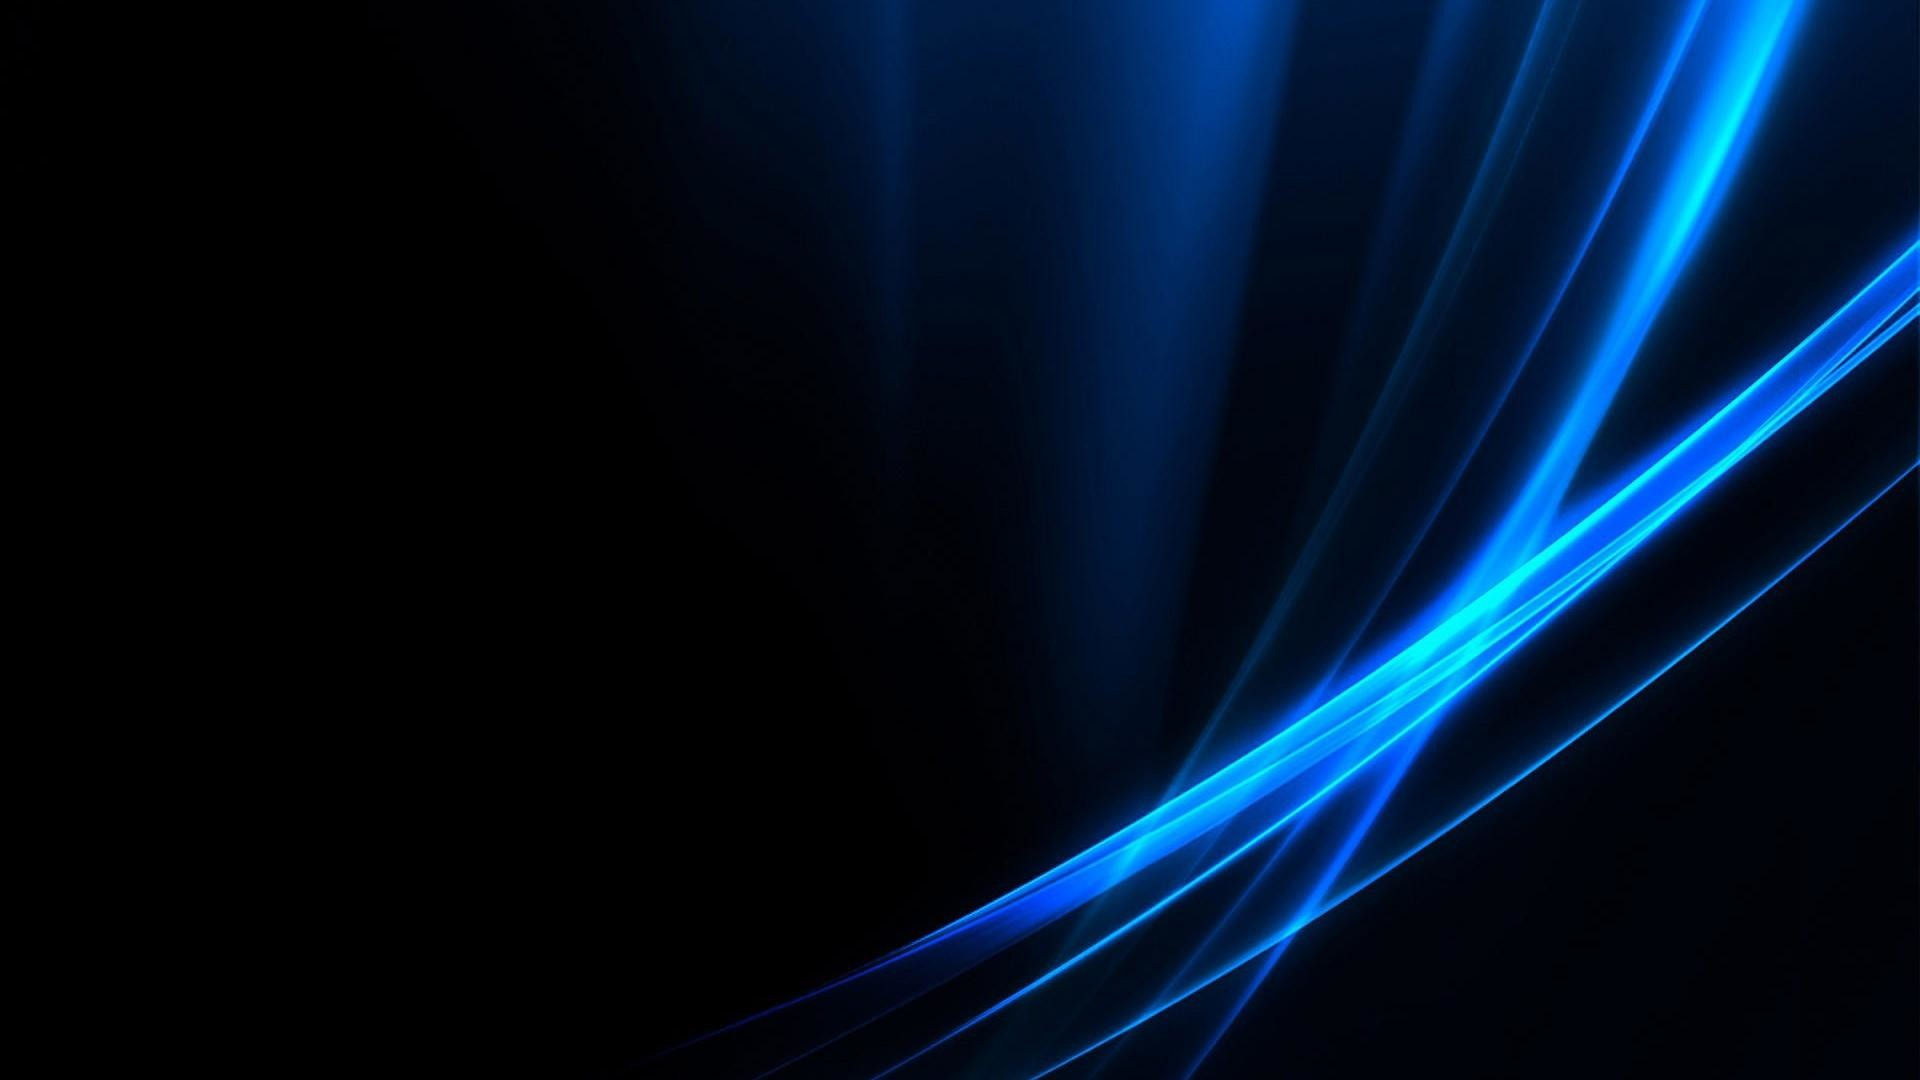 blue wallpaper, Wallpapers, HD 1080p, Desktop Wallpapers .